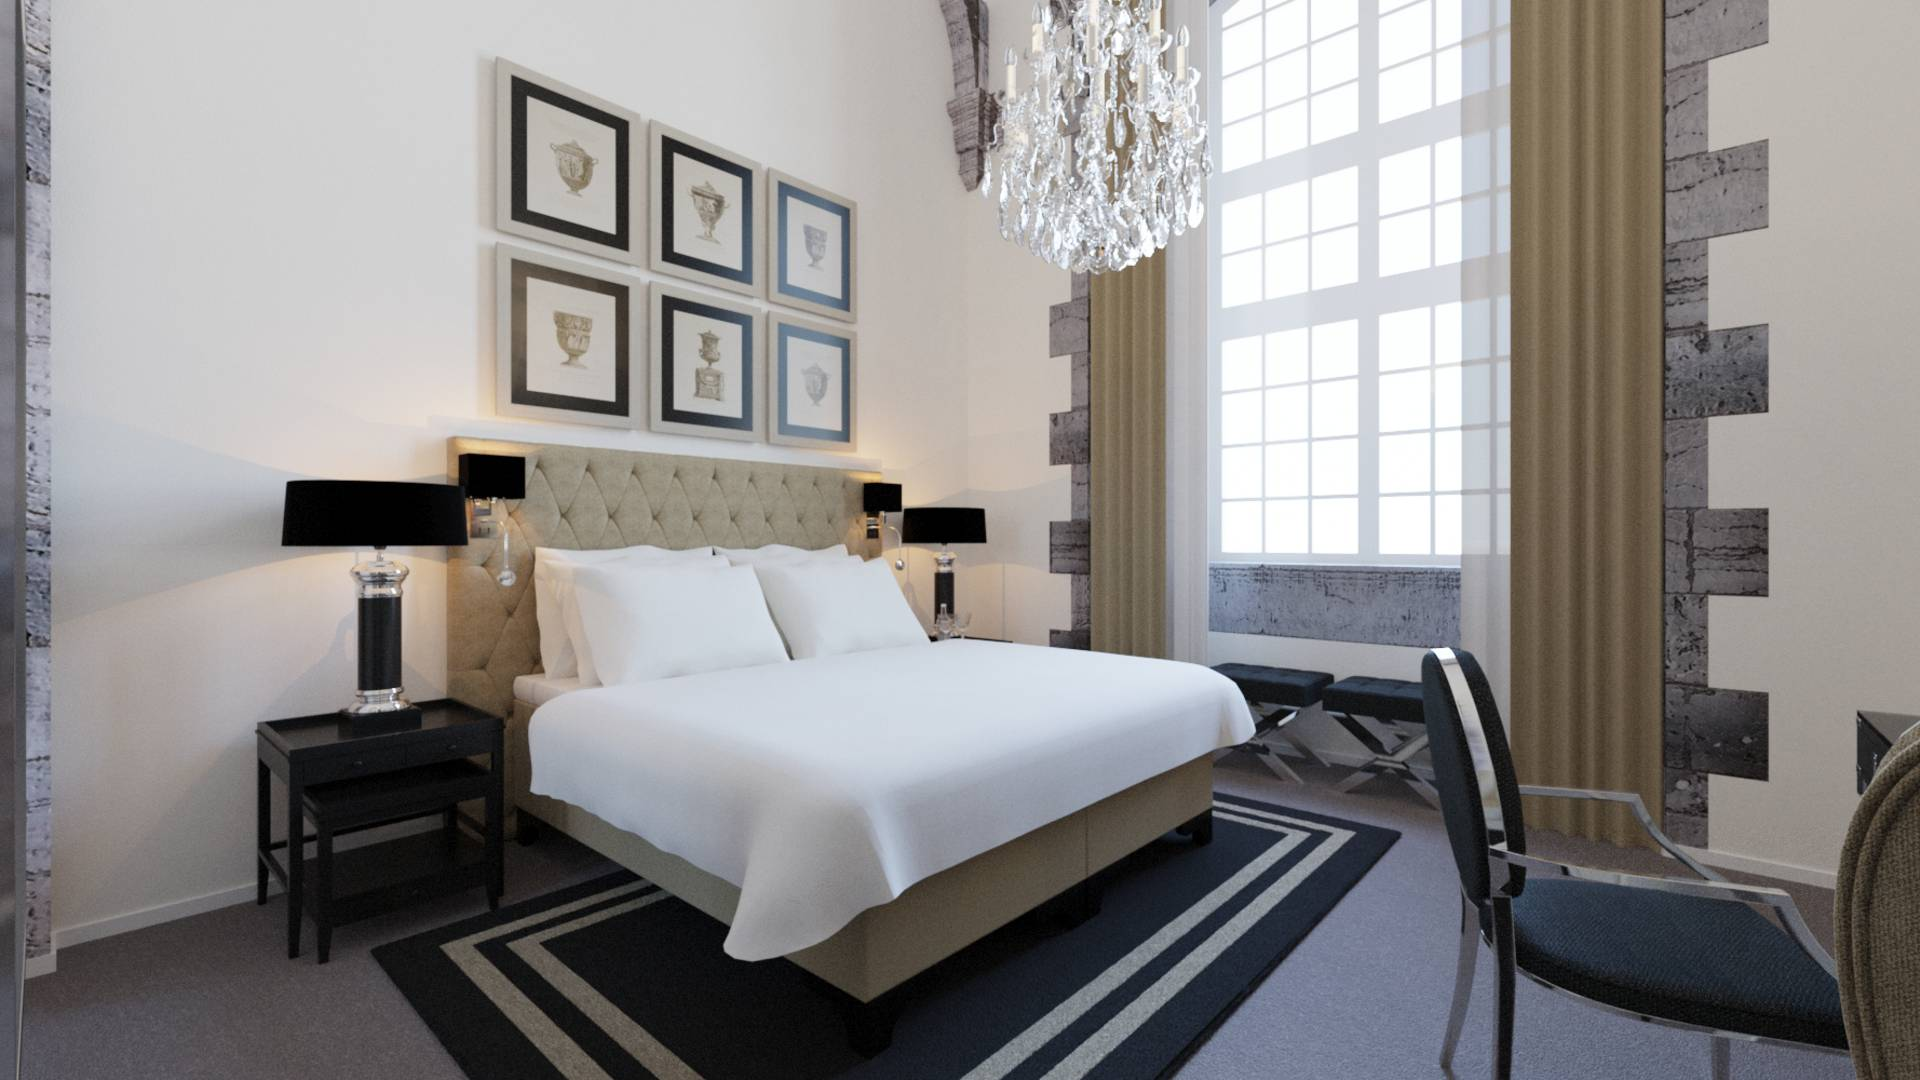 Valenciennes Royal Hainaut spa & resort, chambre